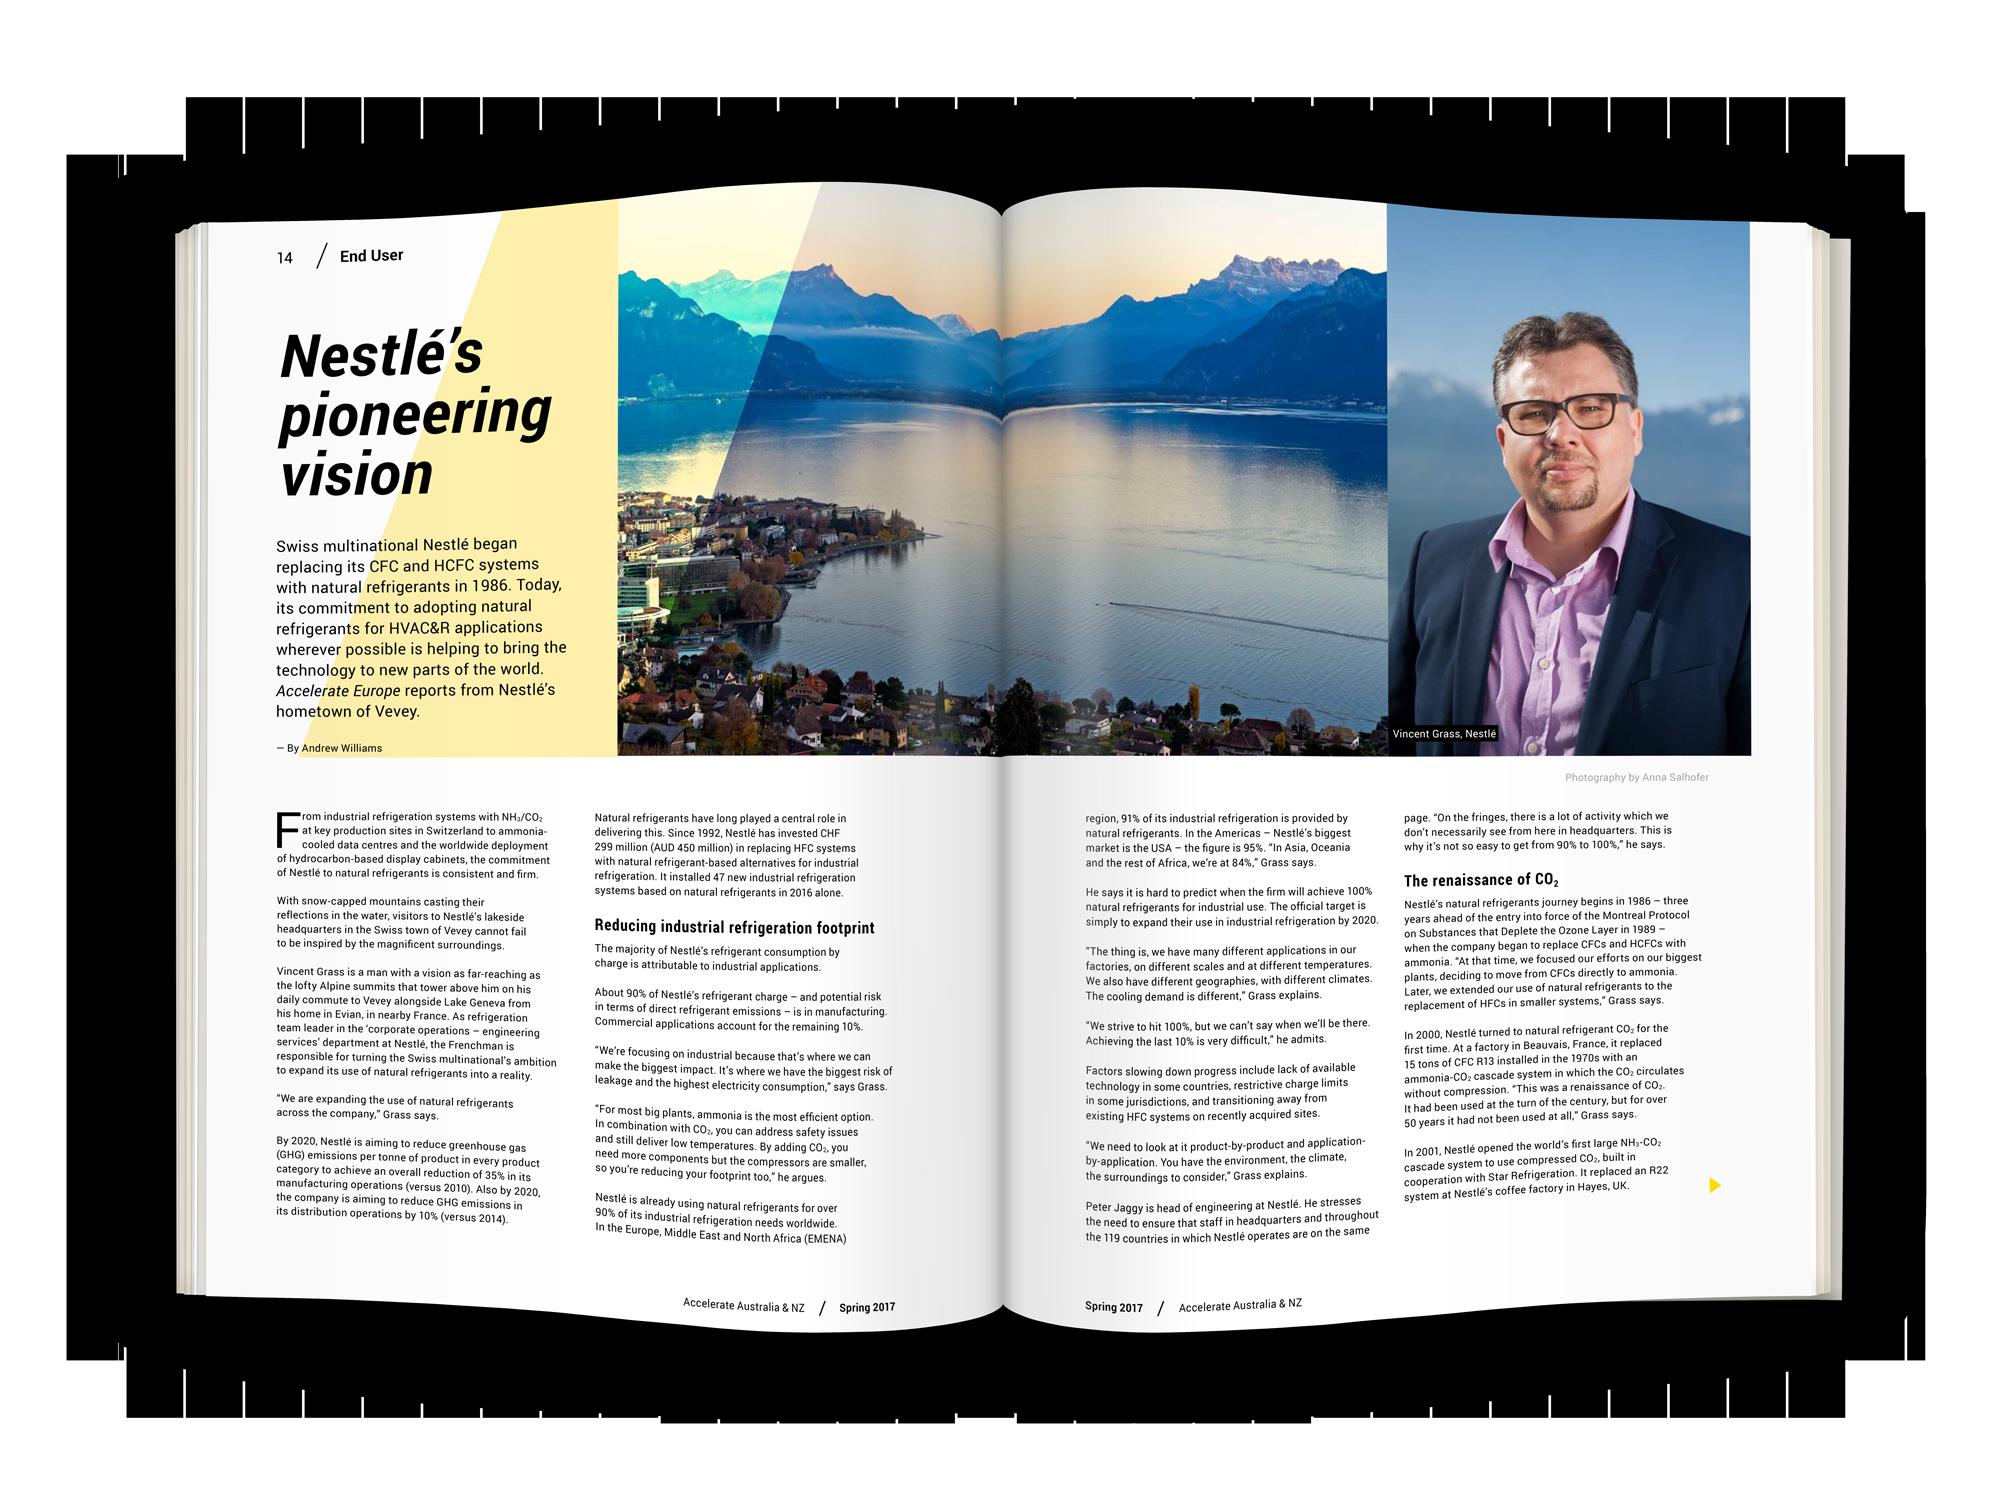 Nestlé's pioneering vision